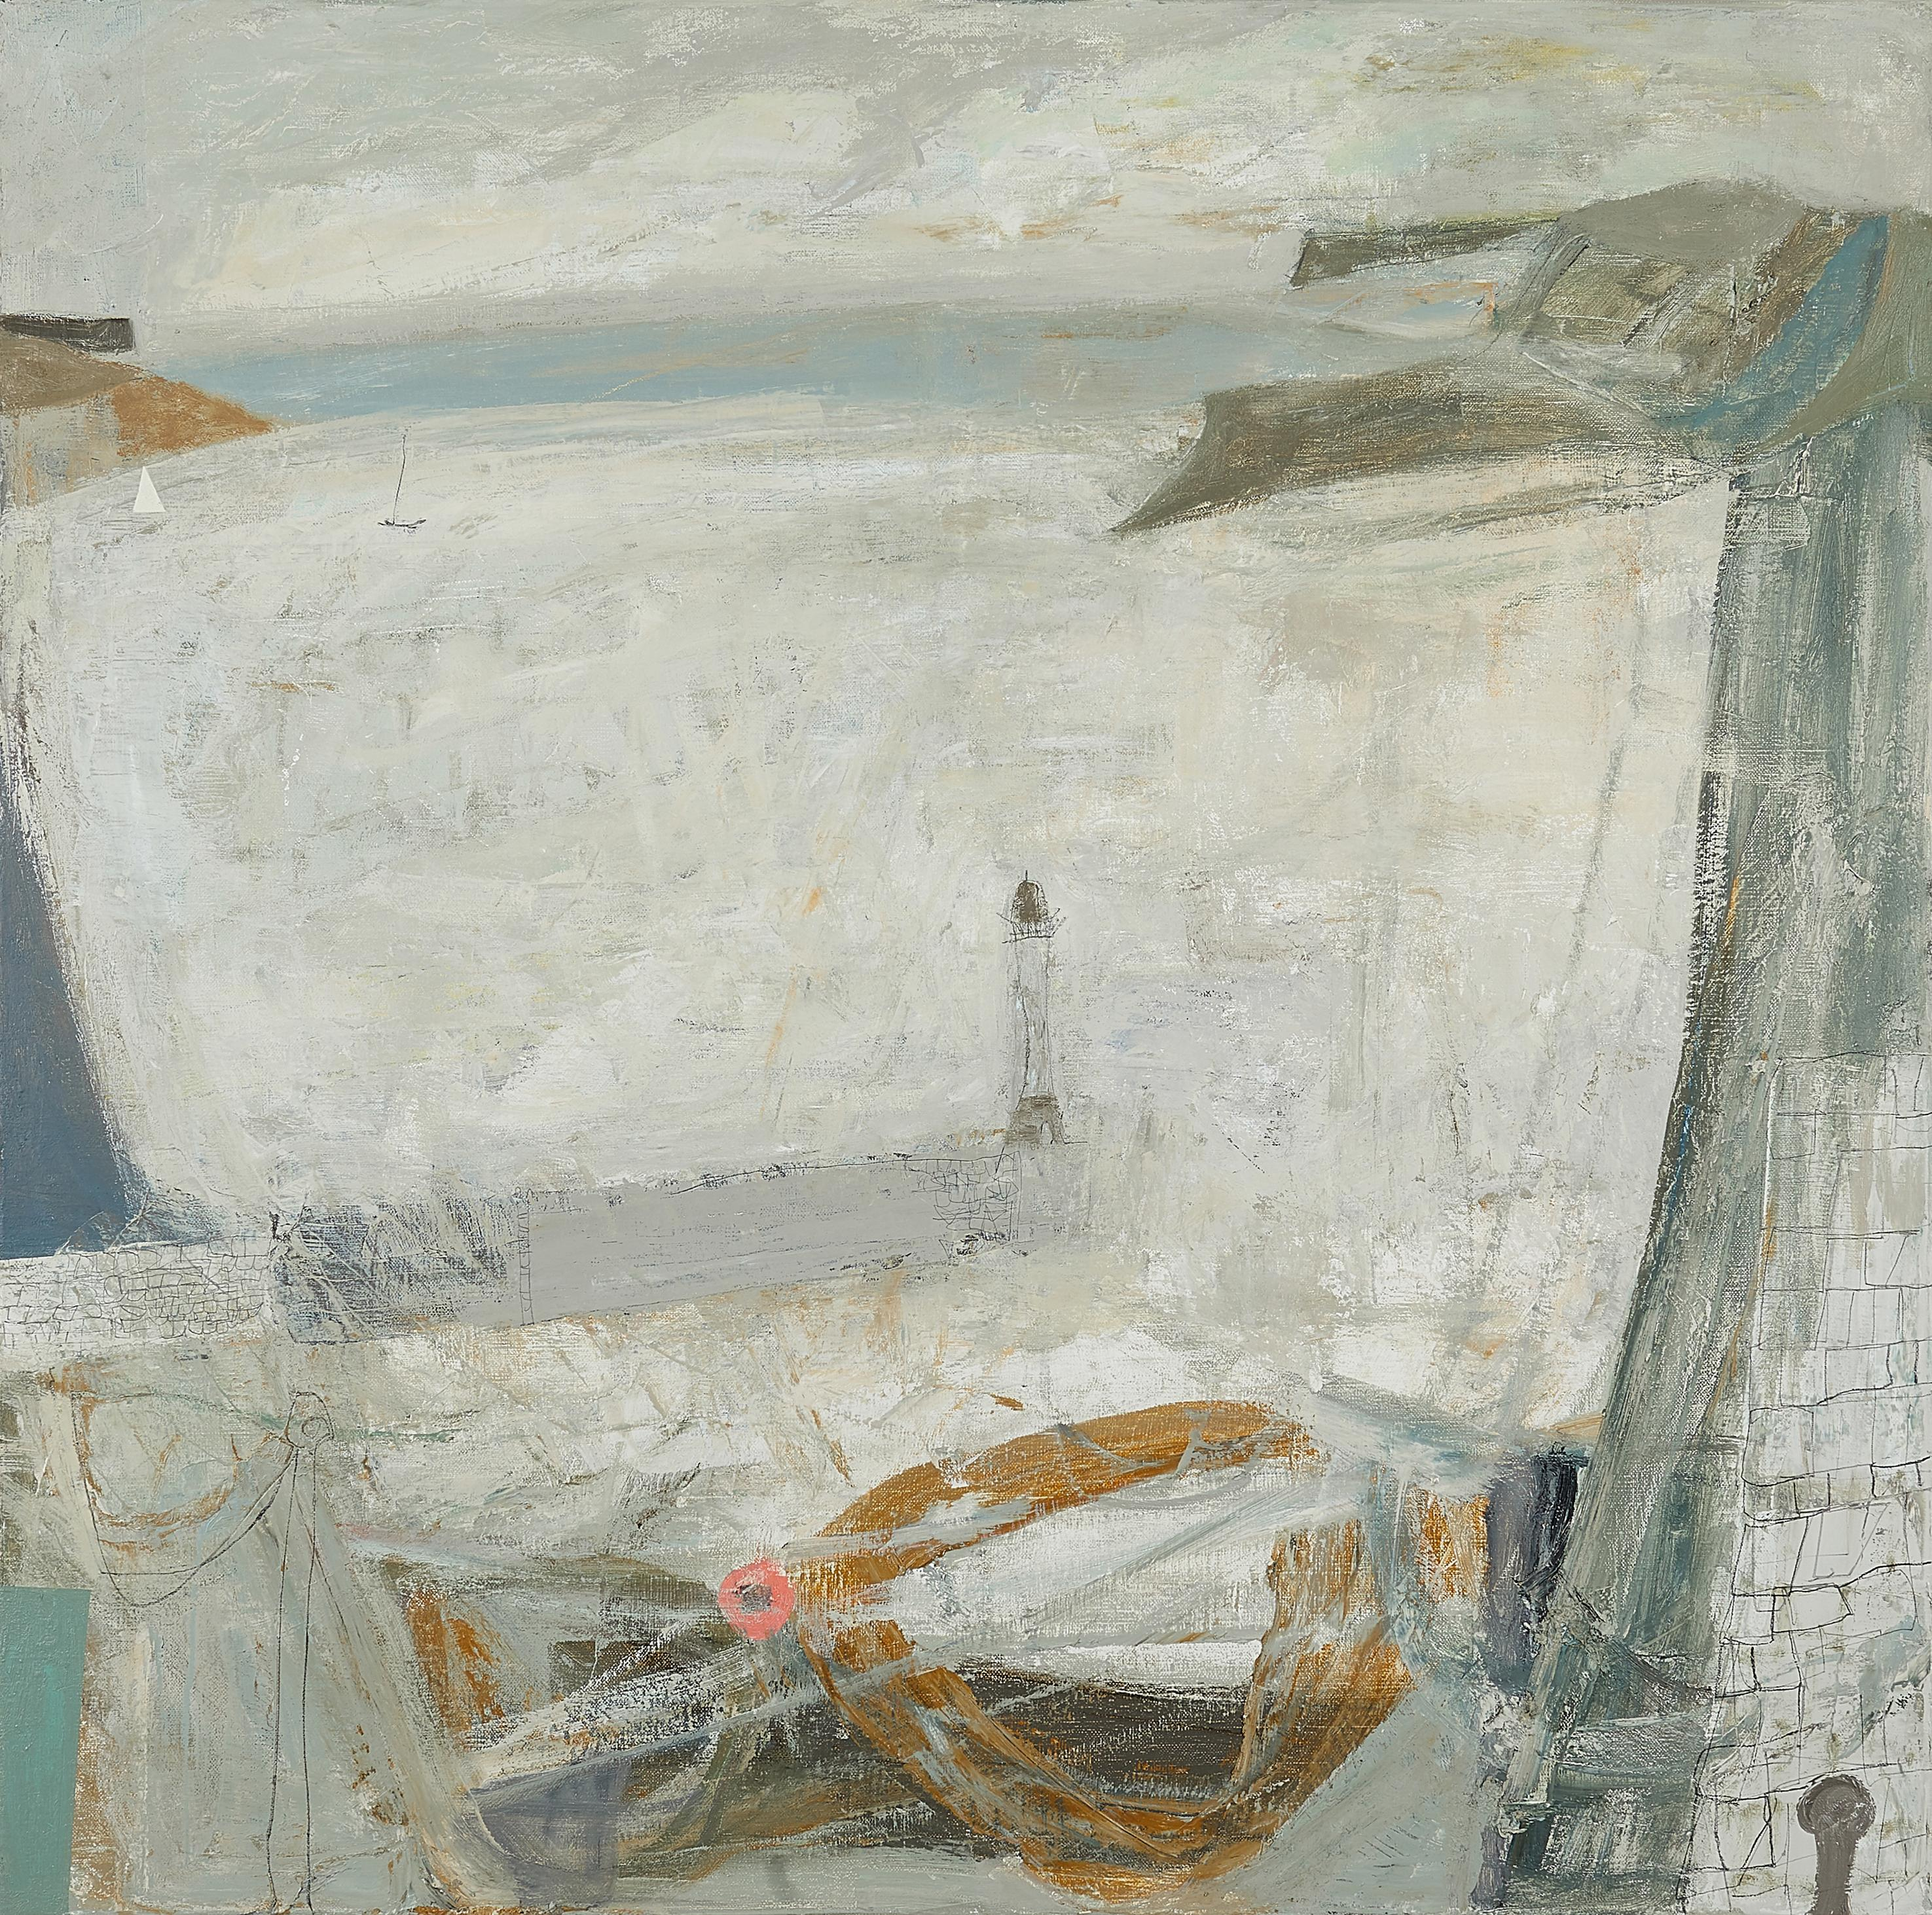 Nicholas Turner, White Sea, large oil painting. Coast, Harbour, Lighthouse